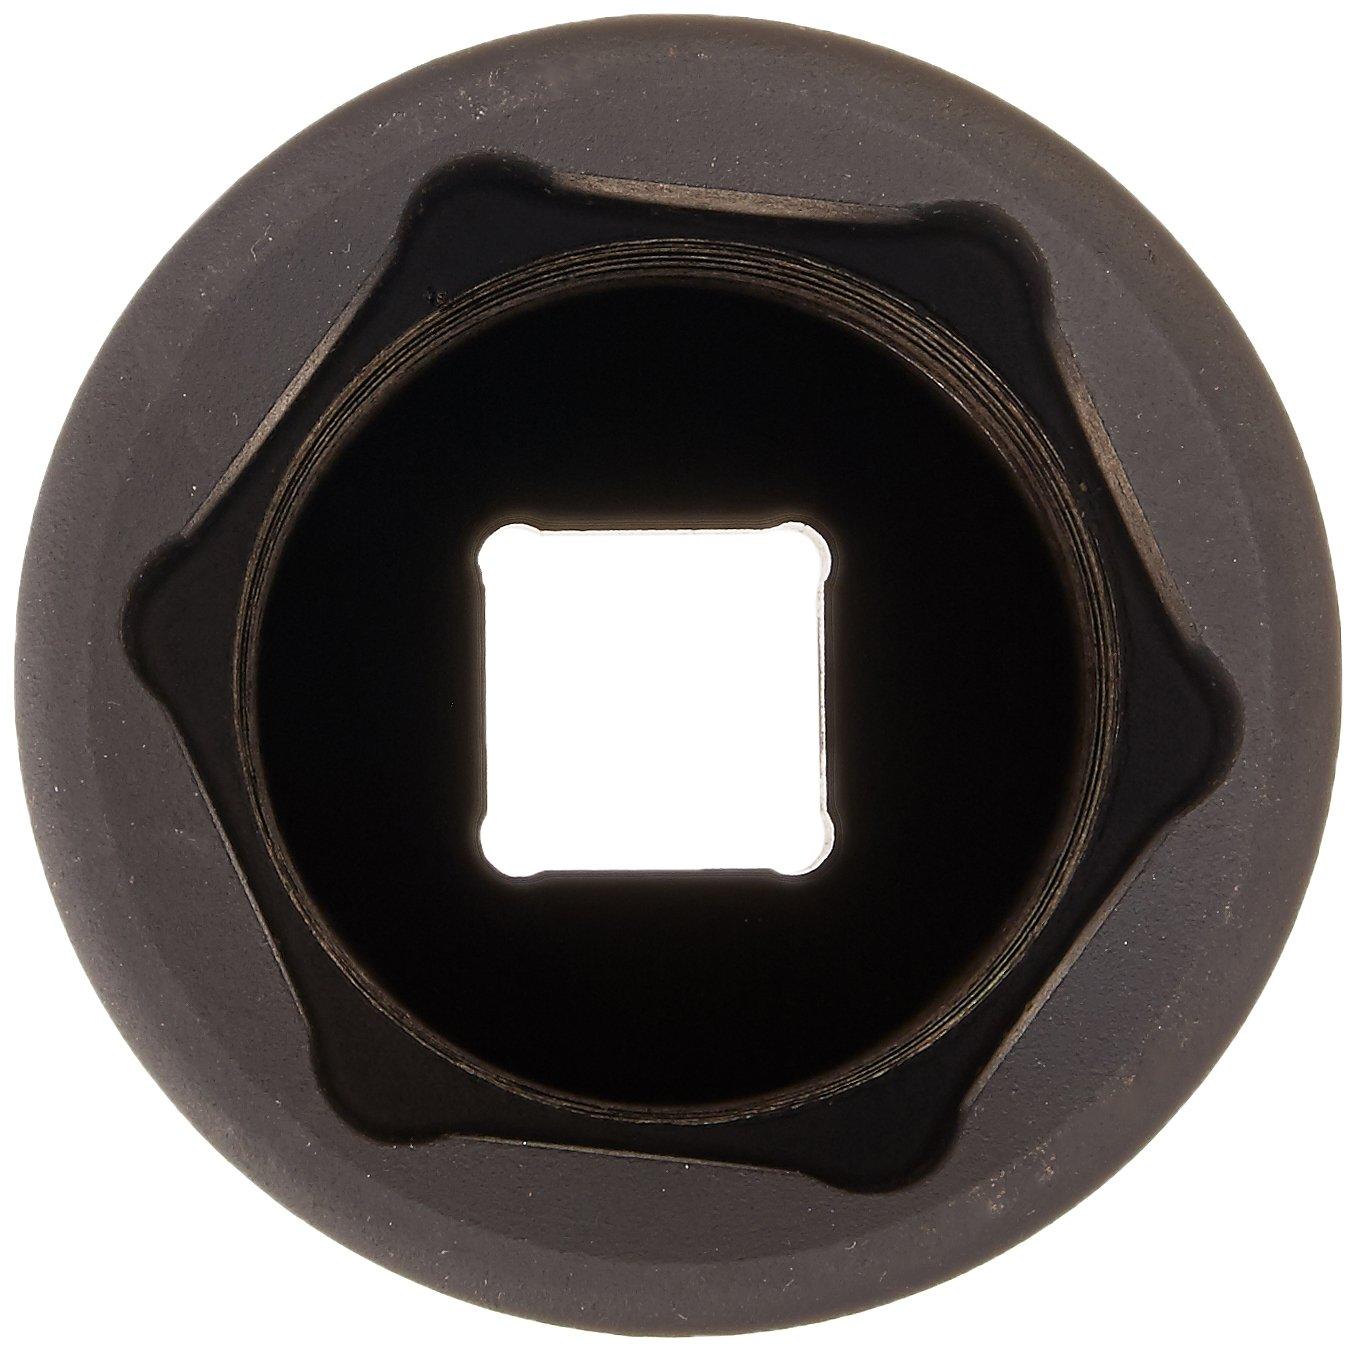 Sunex 240xd 1//2-Inch Drive 1-1//4-Inch Extra Deep Impact Socket